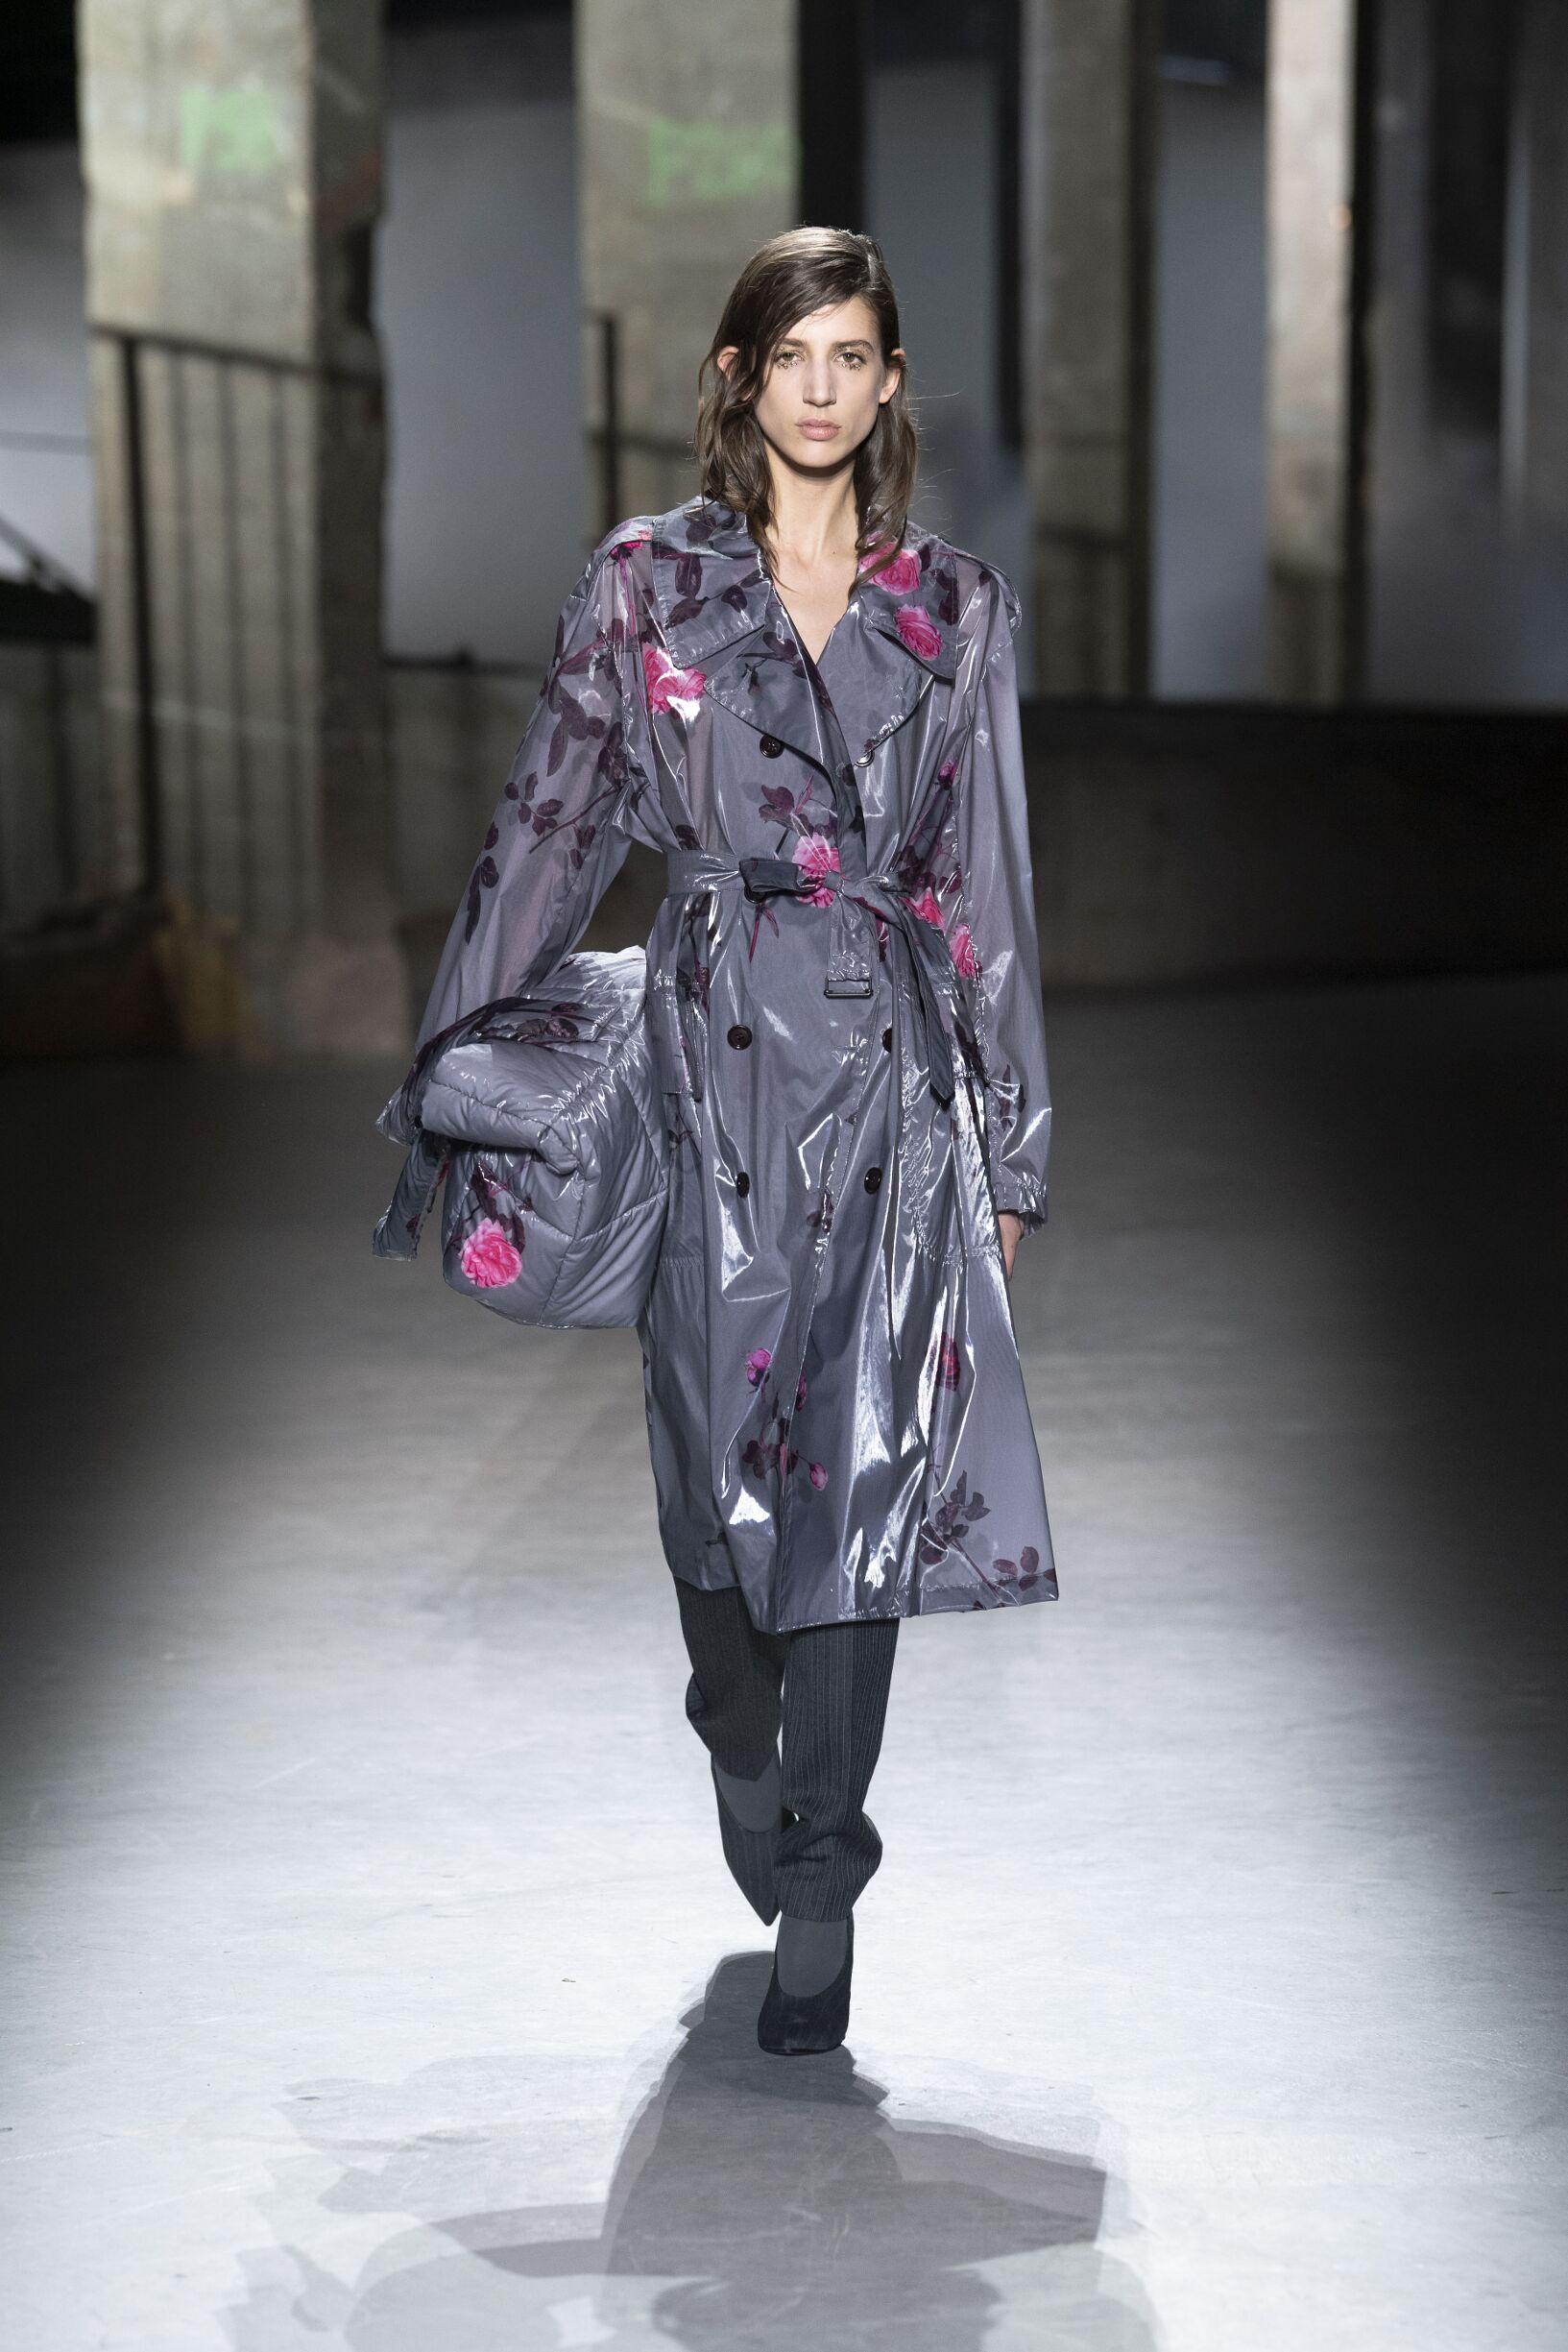 Dries van Noten Fall Winter 2019 Womens Collection Paris Fashion Week